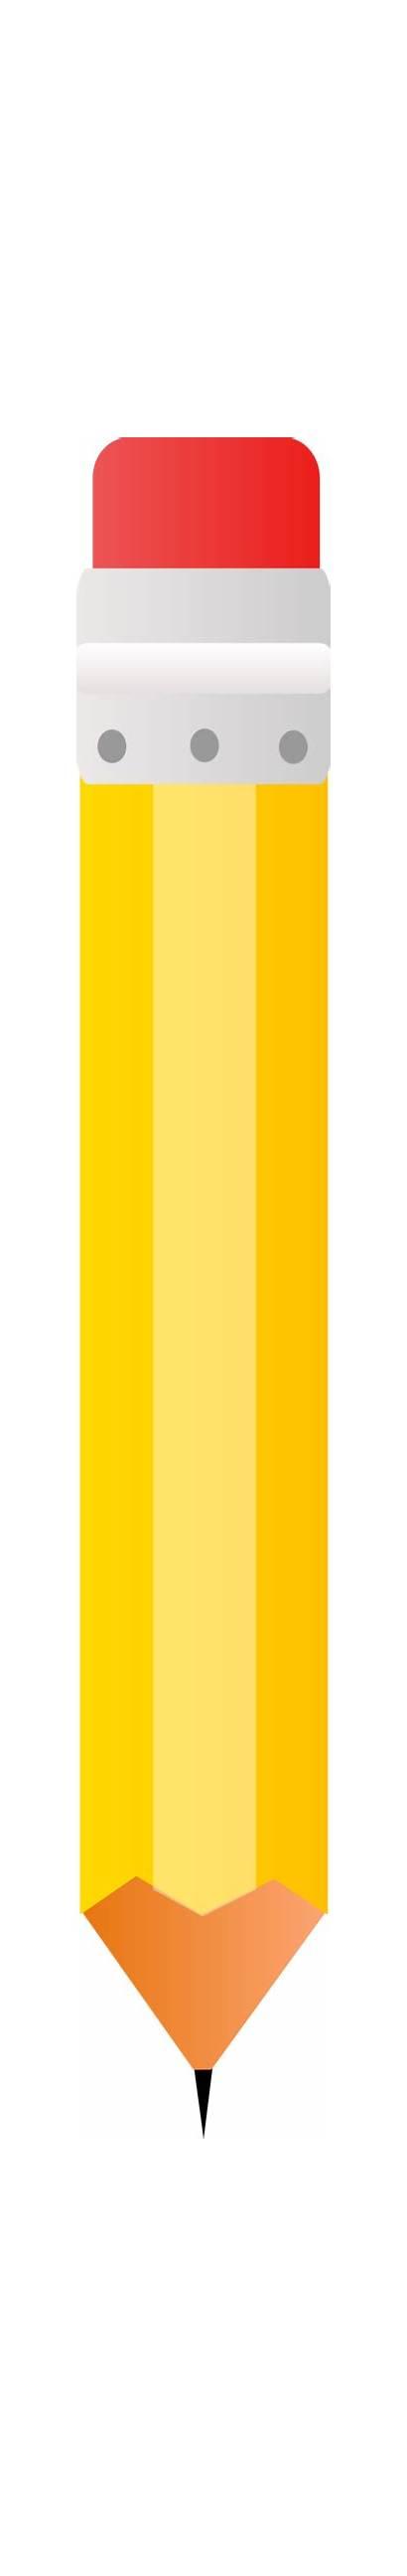 Pencil Clipart قلم رصاص صوره I2clipart Domain